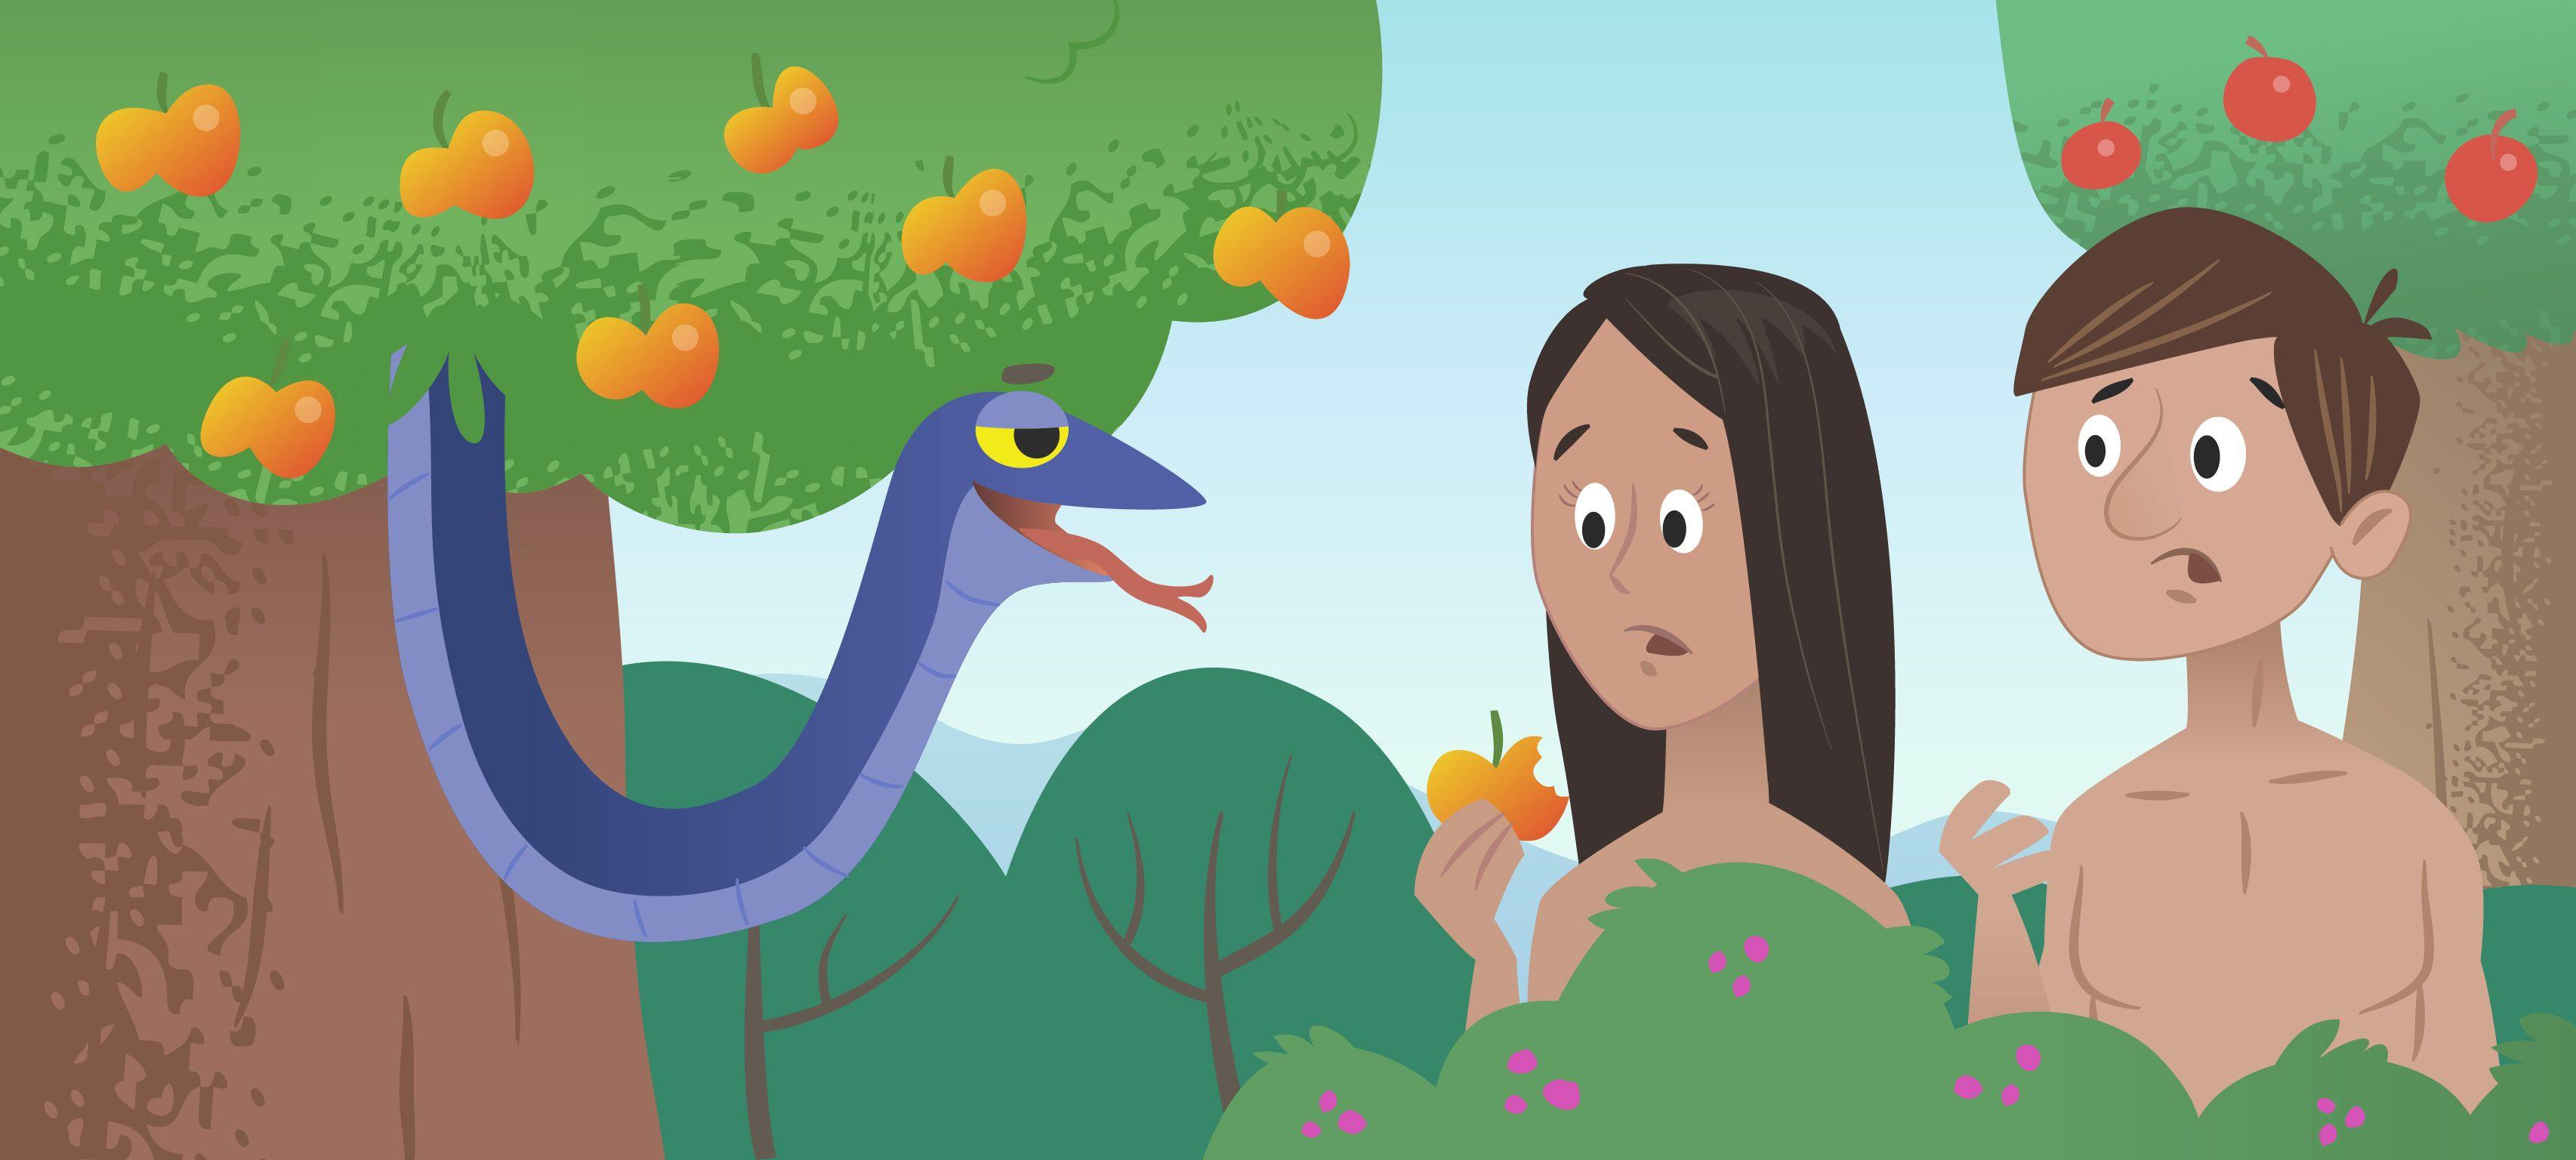 Adam and Eve Bible Story Summary